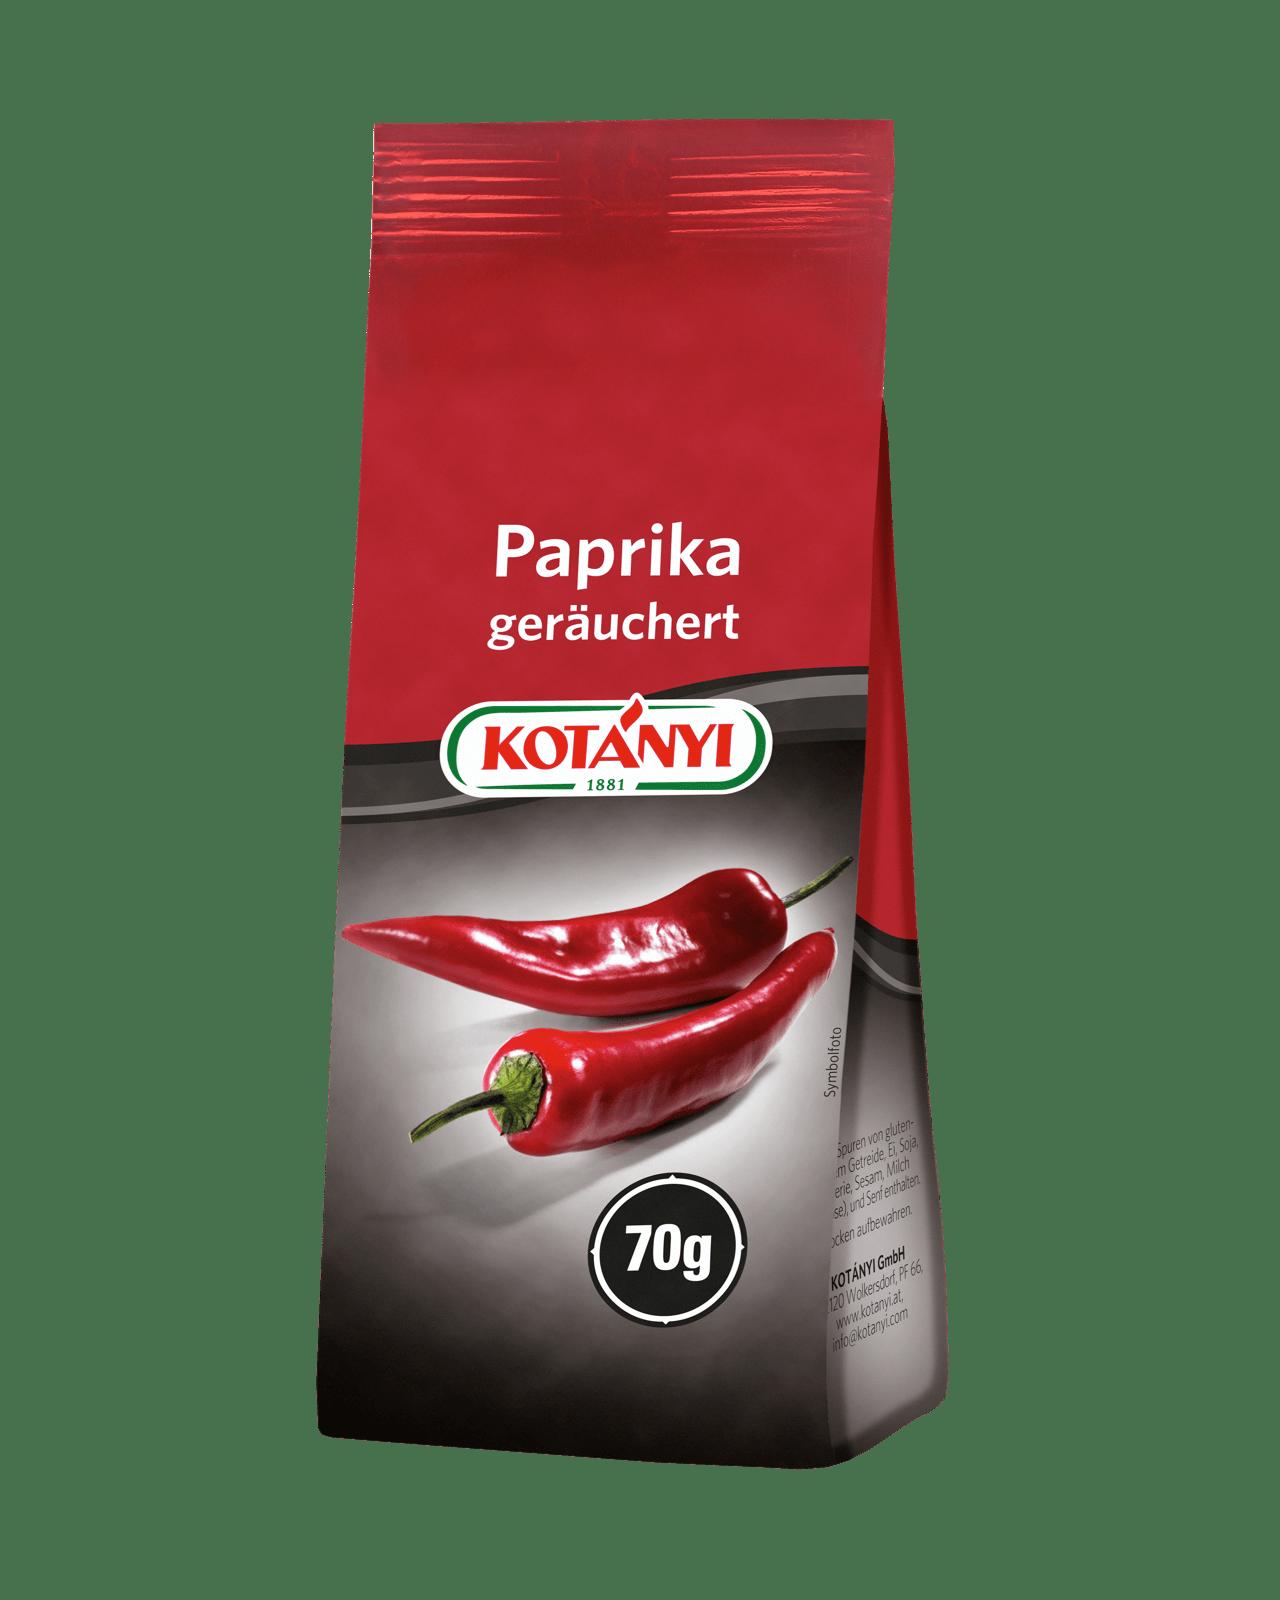 Kotányi Paprika Geräuchert in de 70g Vorratspackung